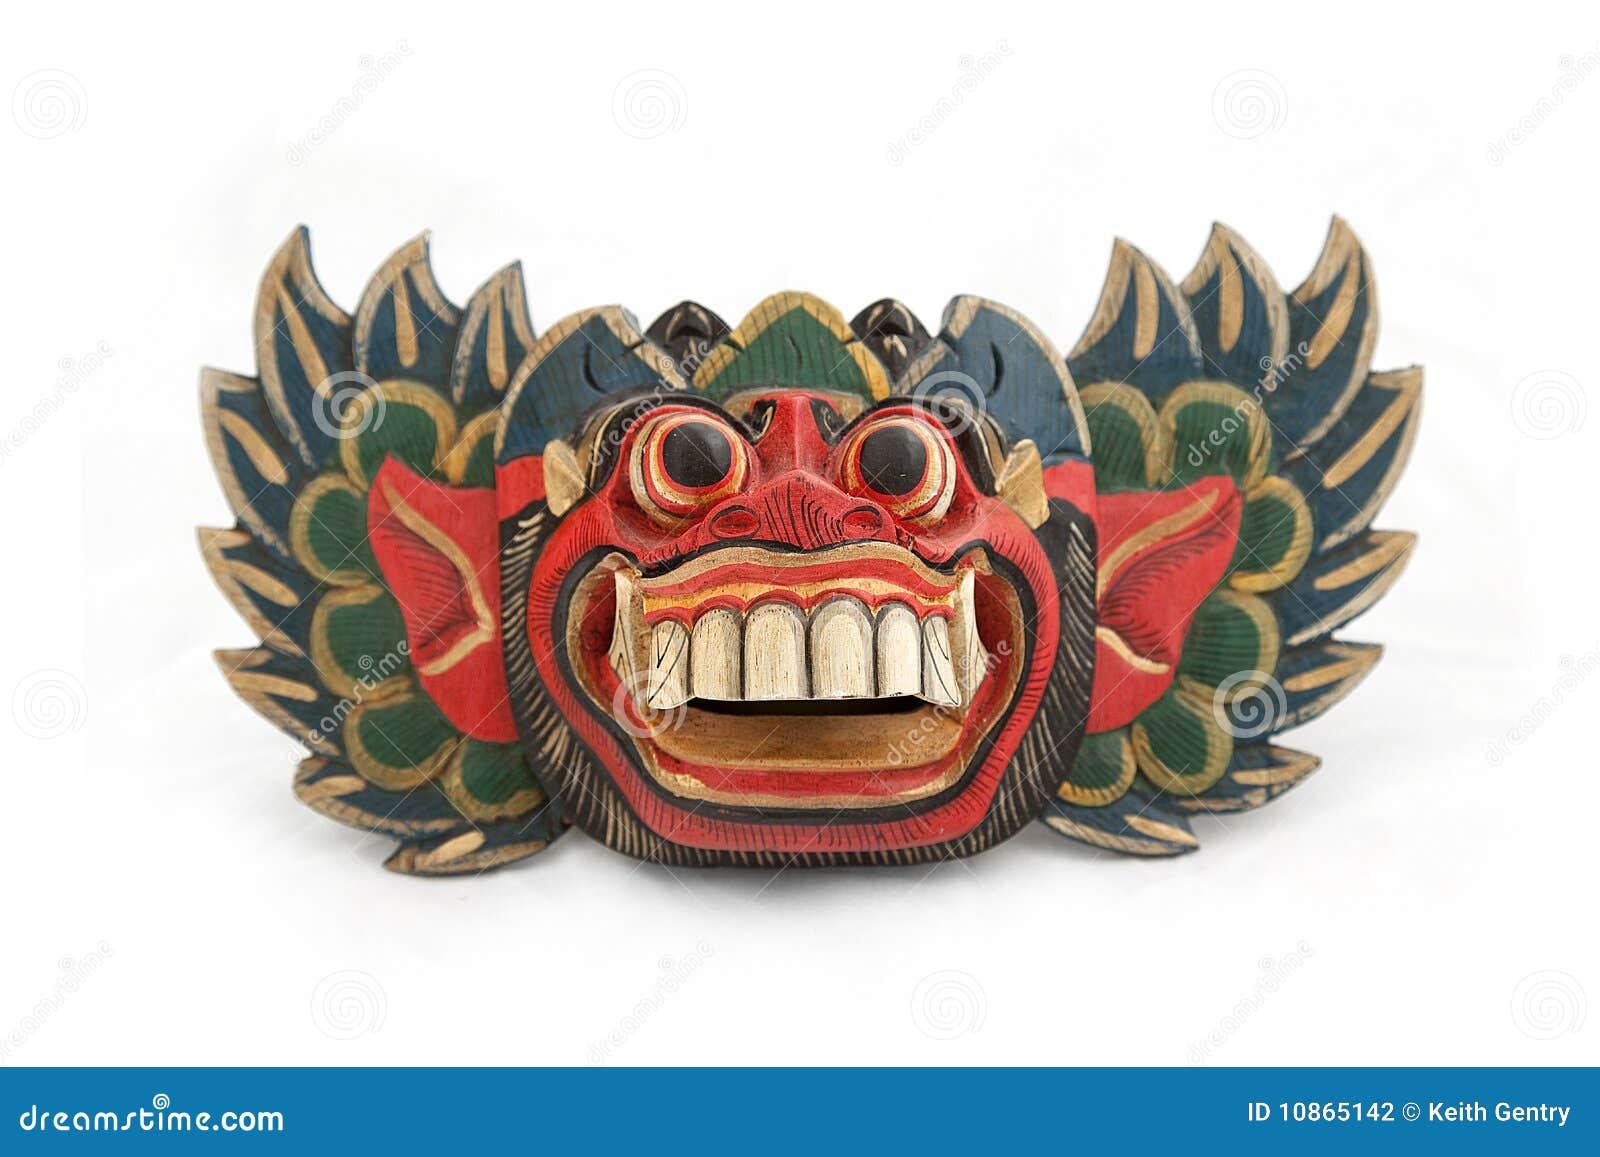 balinese barong mask stock photography image 10865142